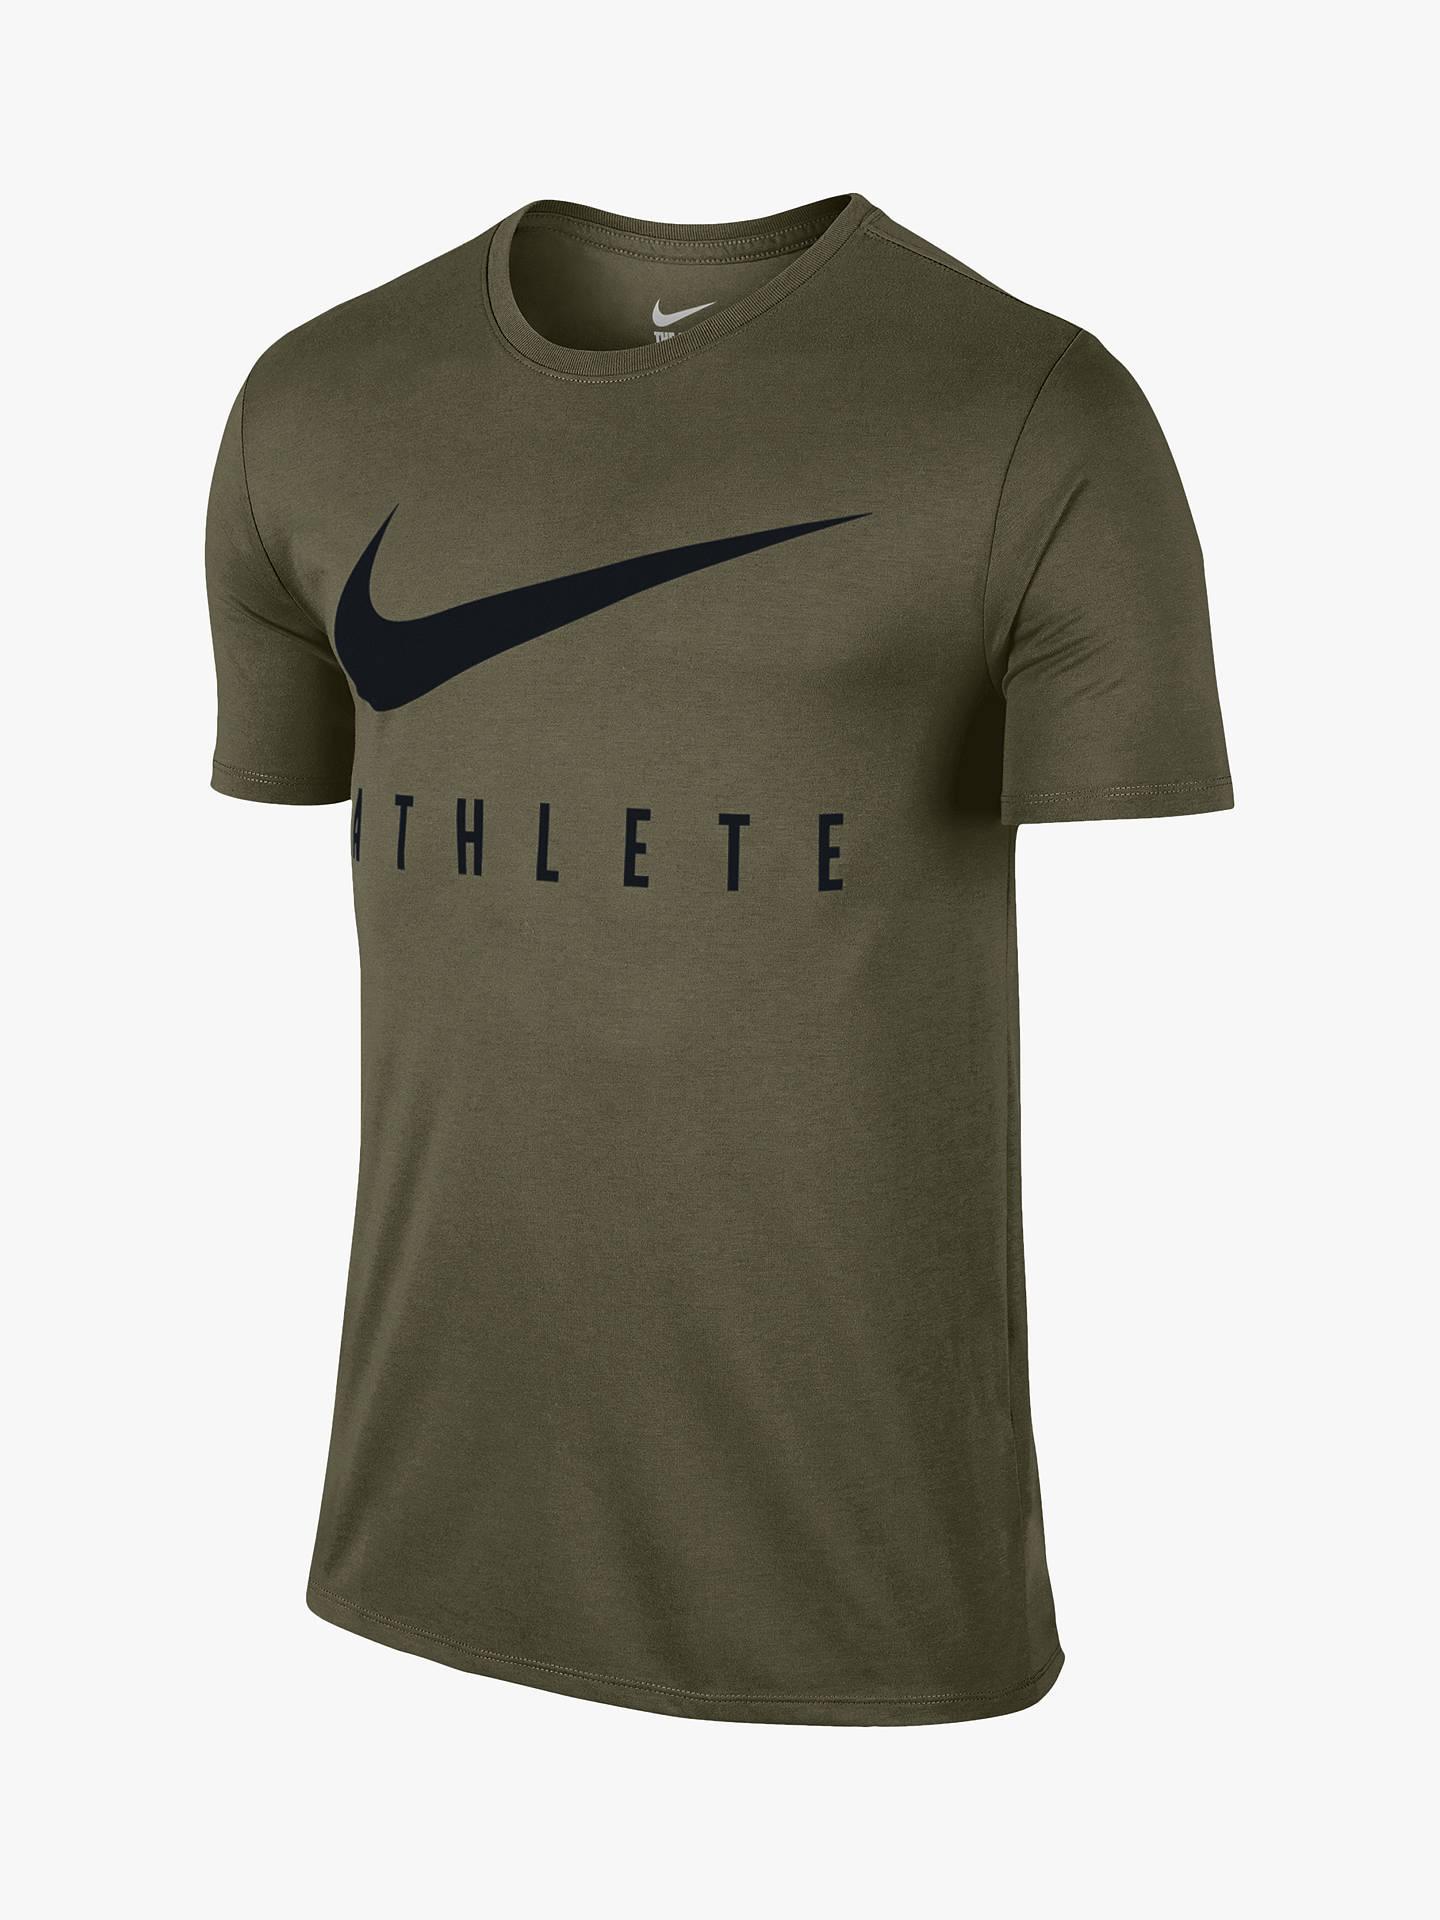 663d5d4bc Buy Nike Dry Athlete Training T-Shirt, Olive Canvas/Black, S Online ...